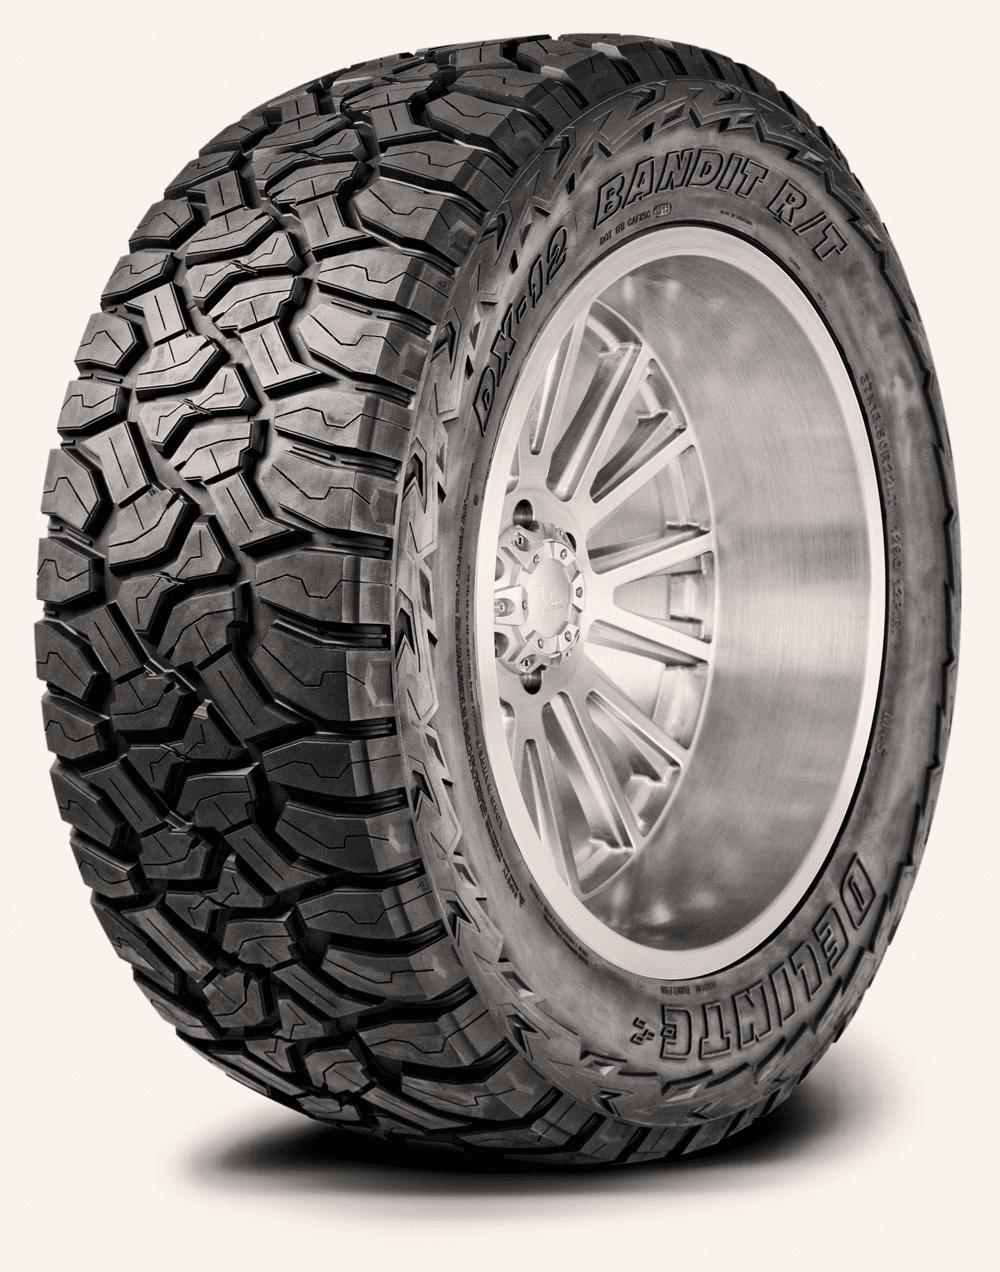 Delinte The Bandit R/T Tire